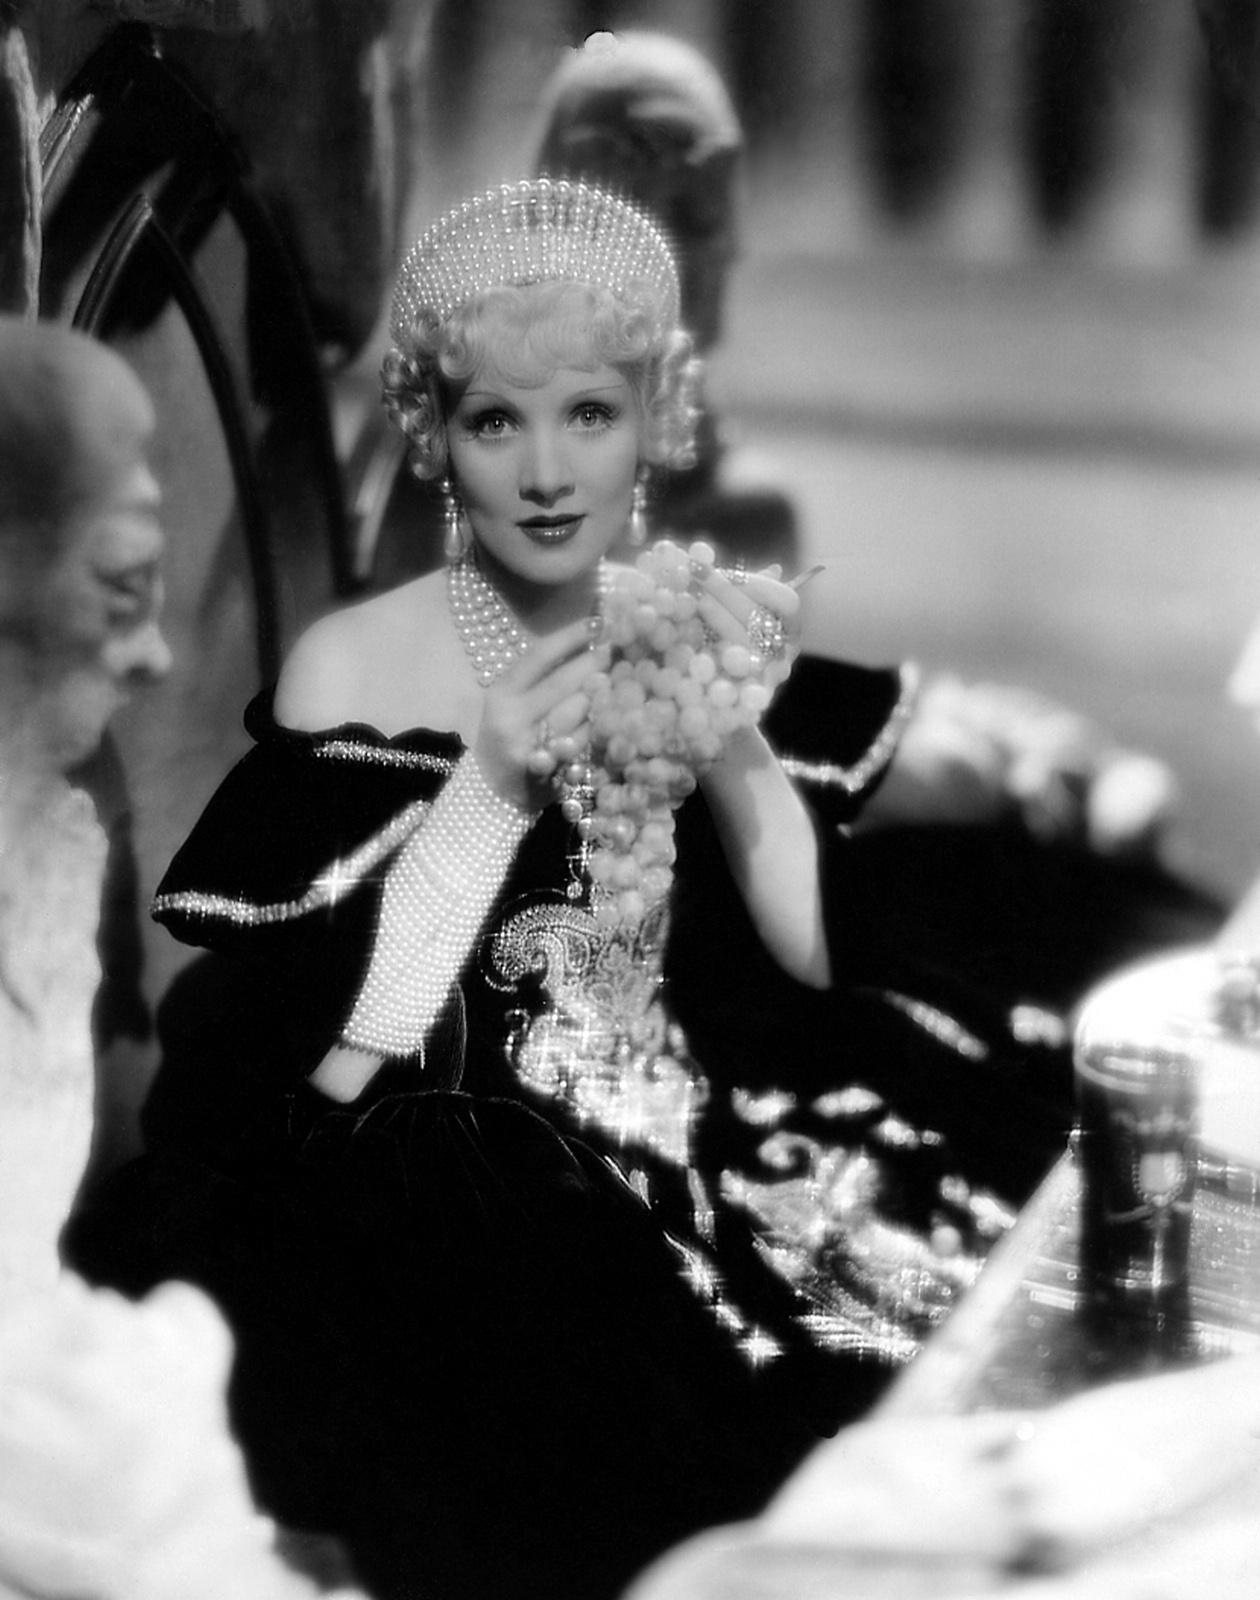 Marlene Dietrich Annex2: The Foxling: The Scarlet Empress Costume Designs